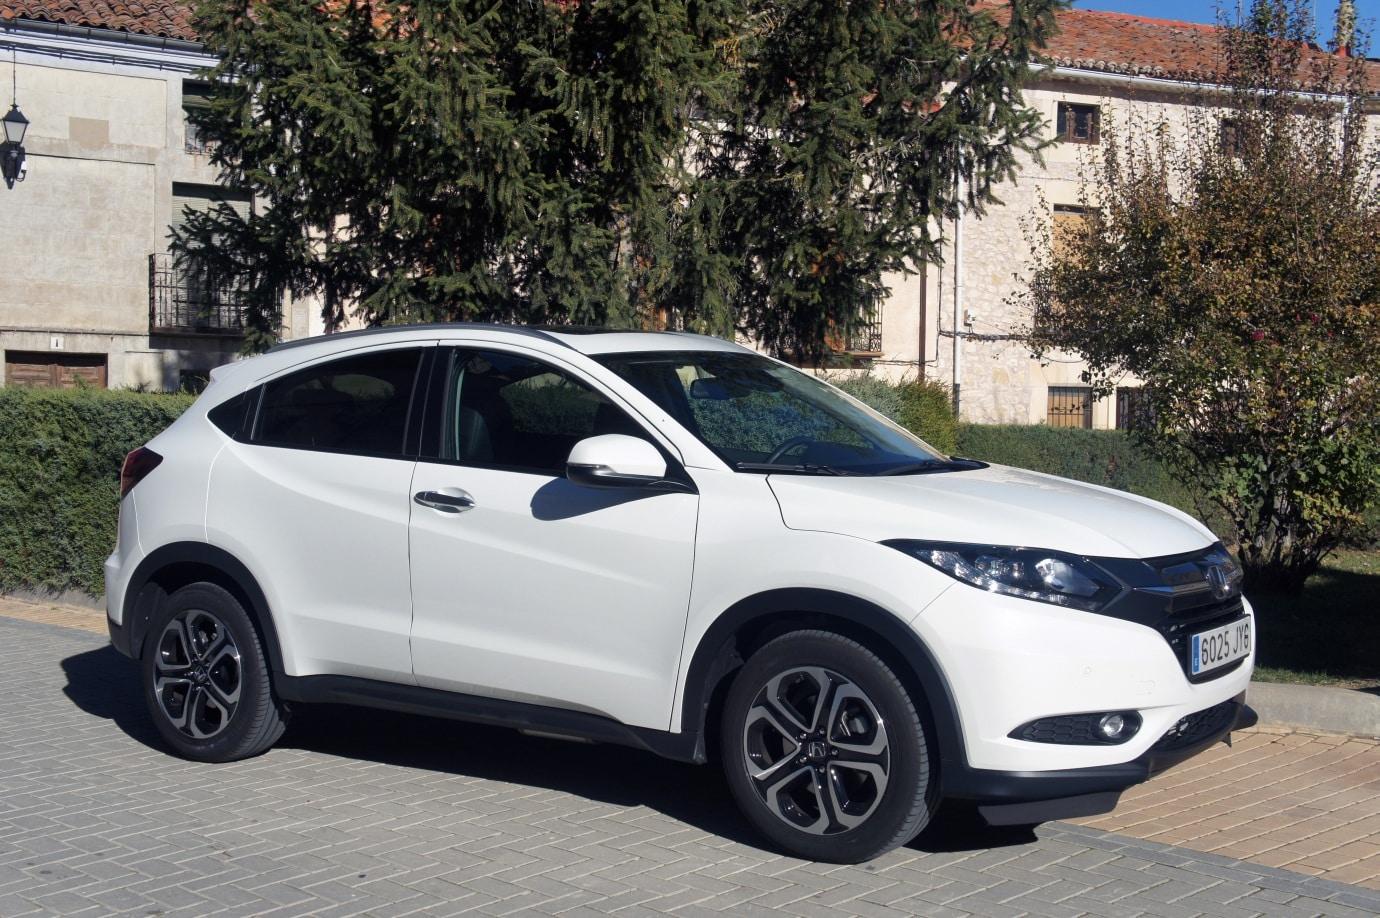 Prueba Honda HR-V 1.6 i-DTEC 120 CV Executive: De lo mejor del segmento